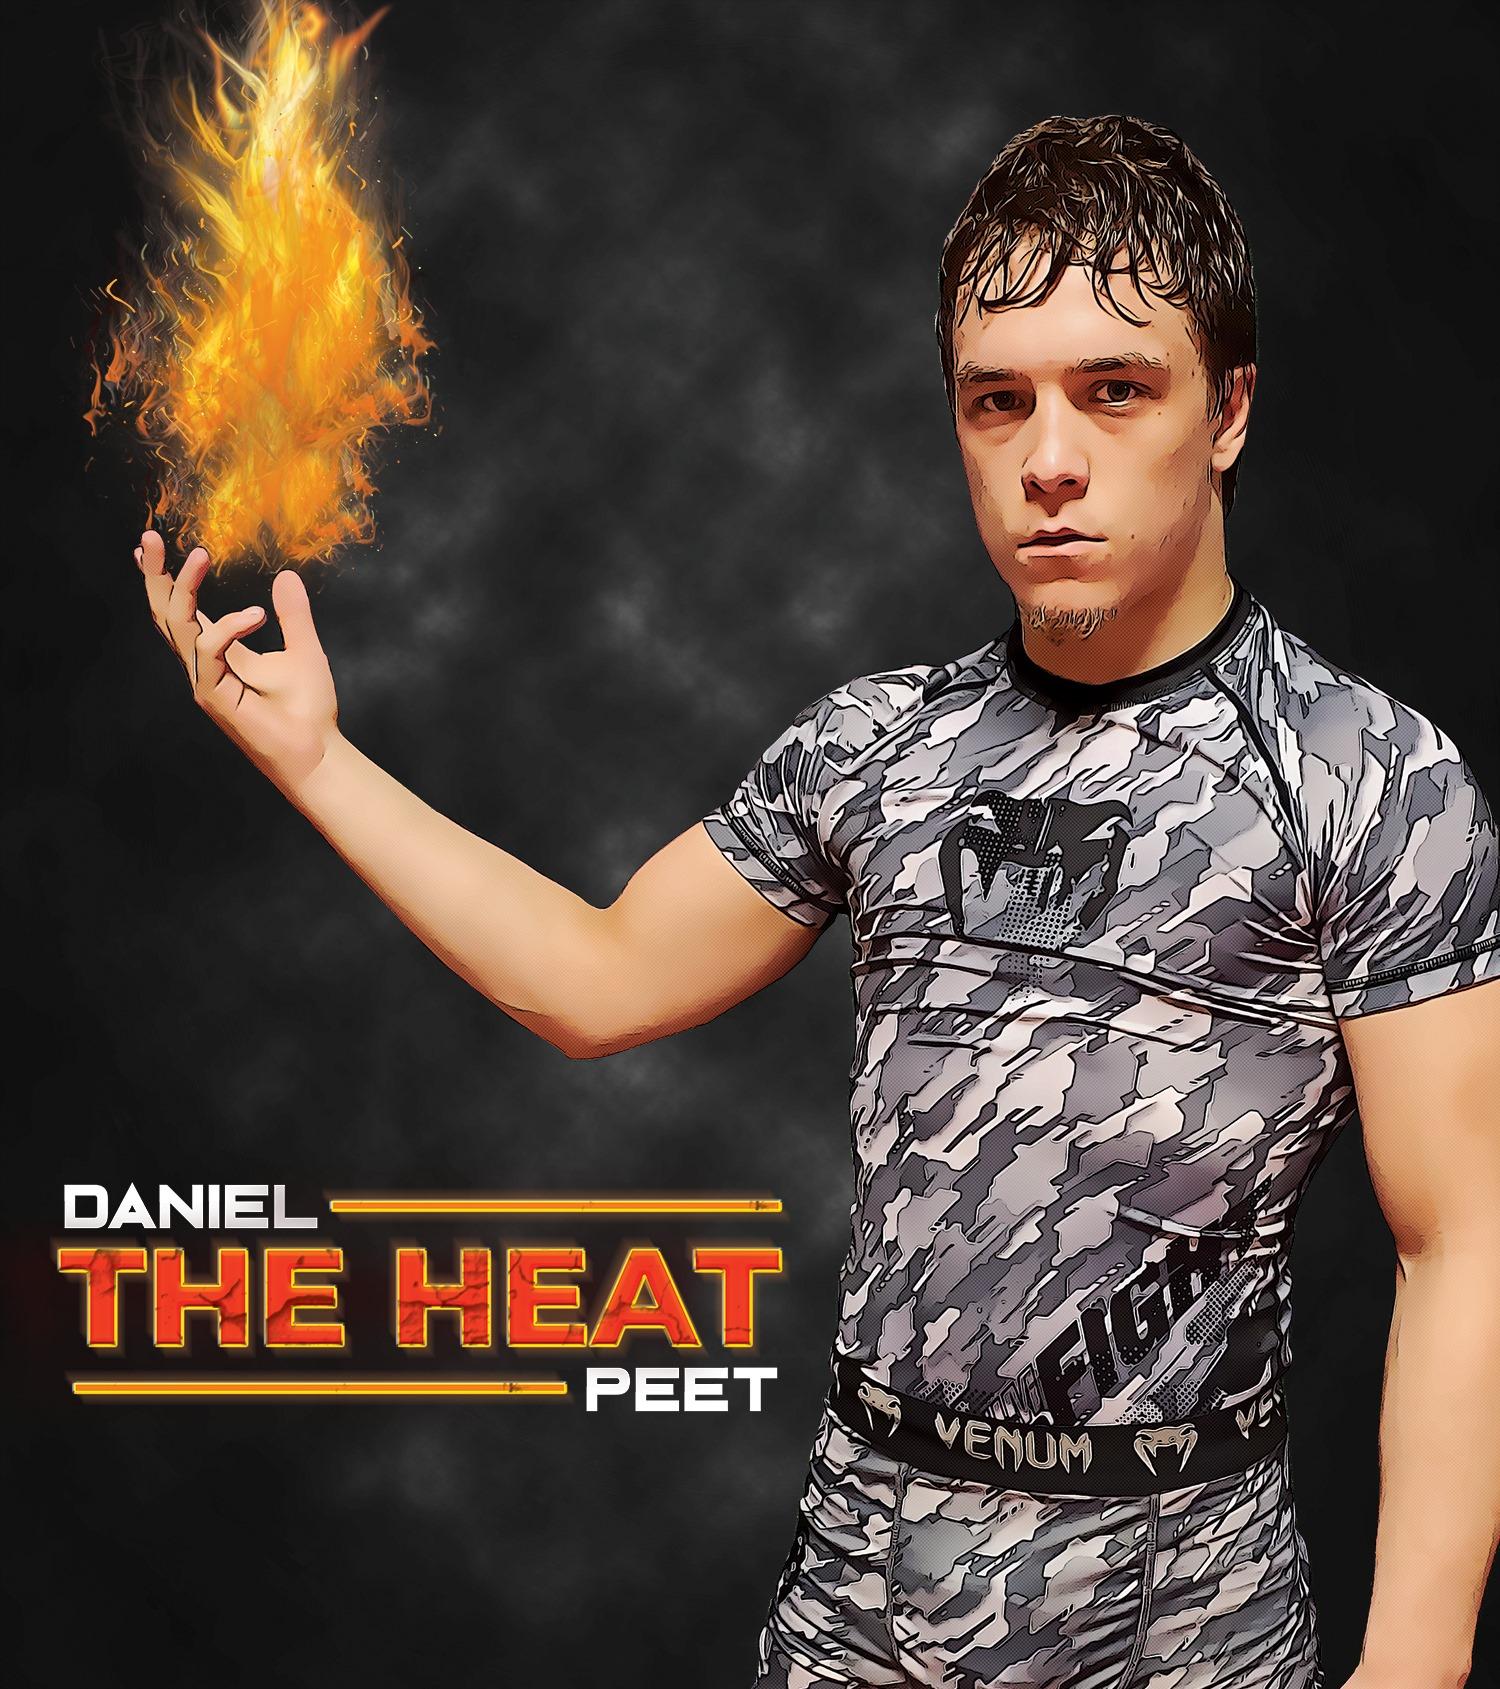 daniel-the-heat-peet